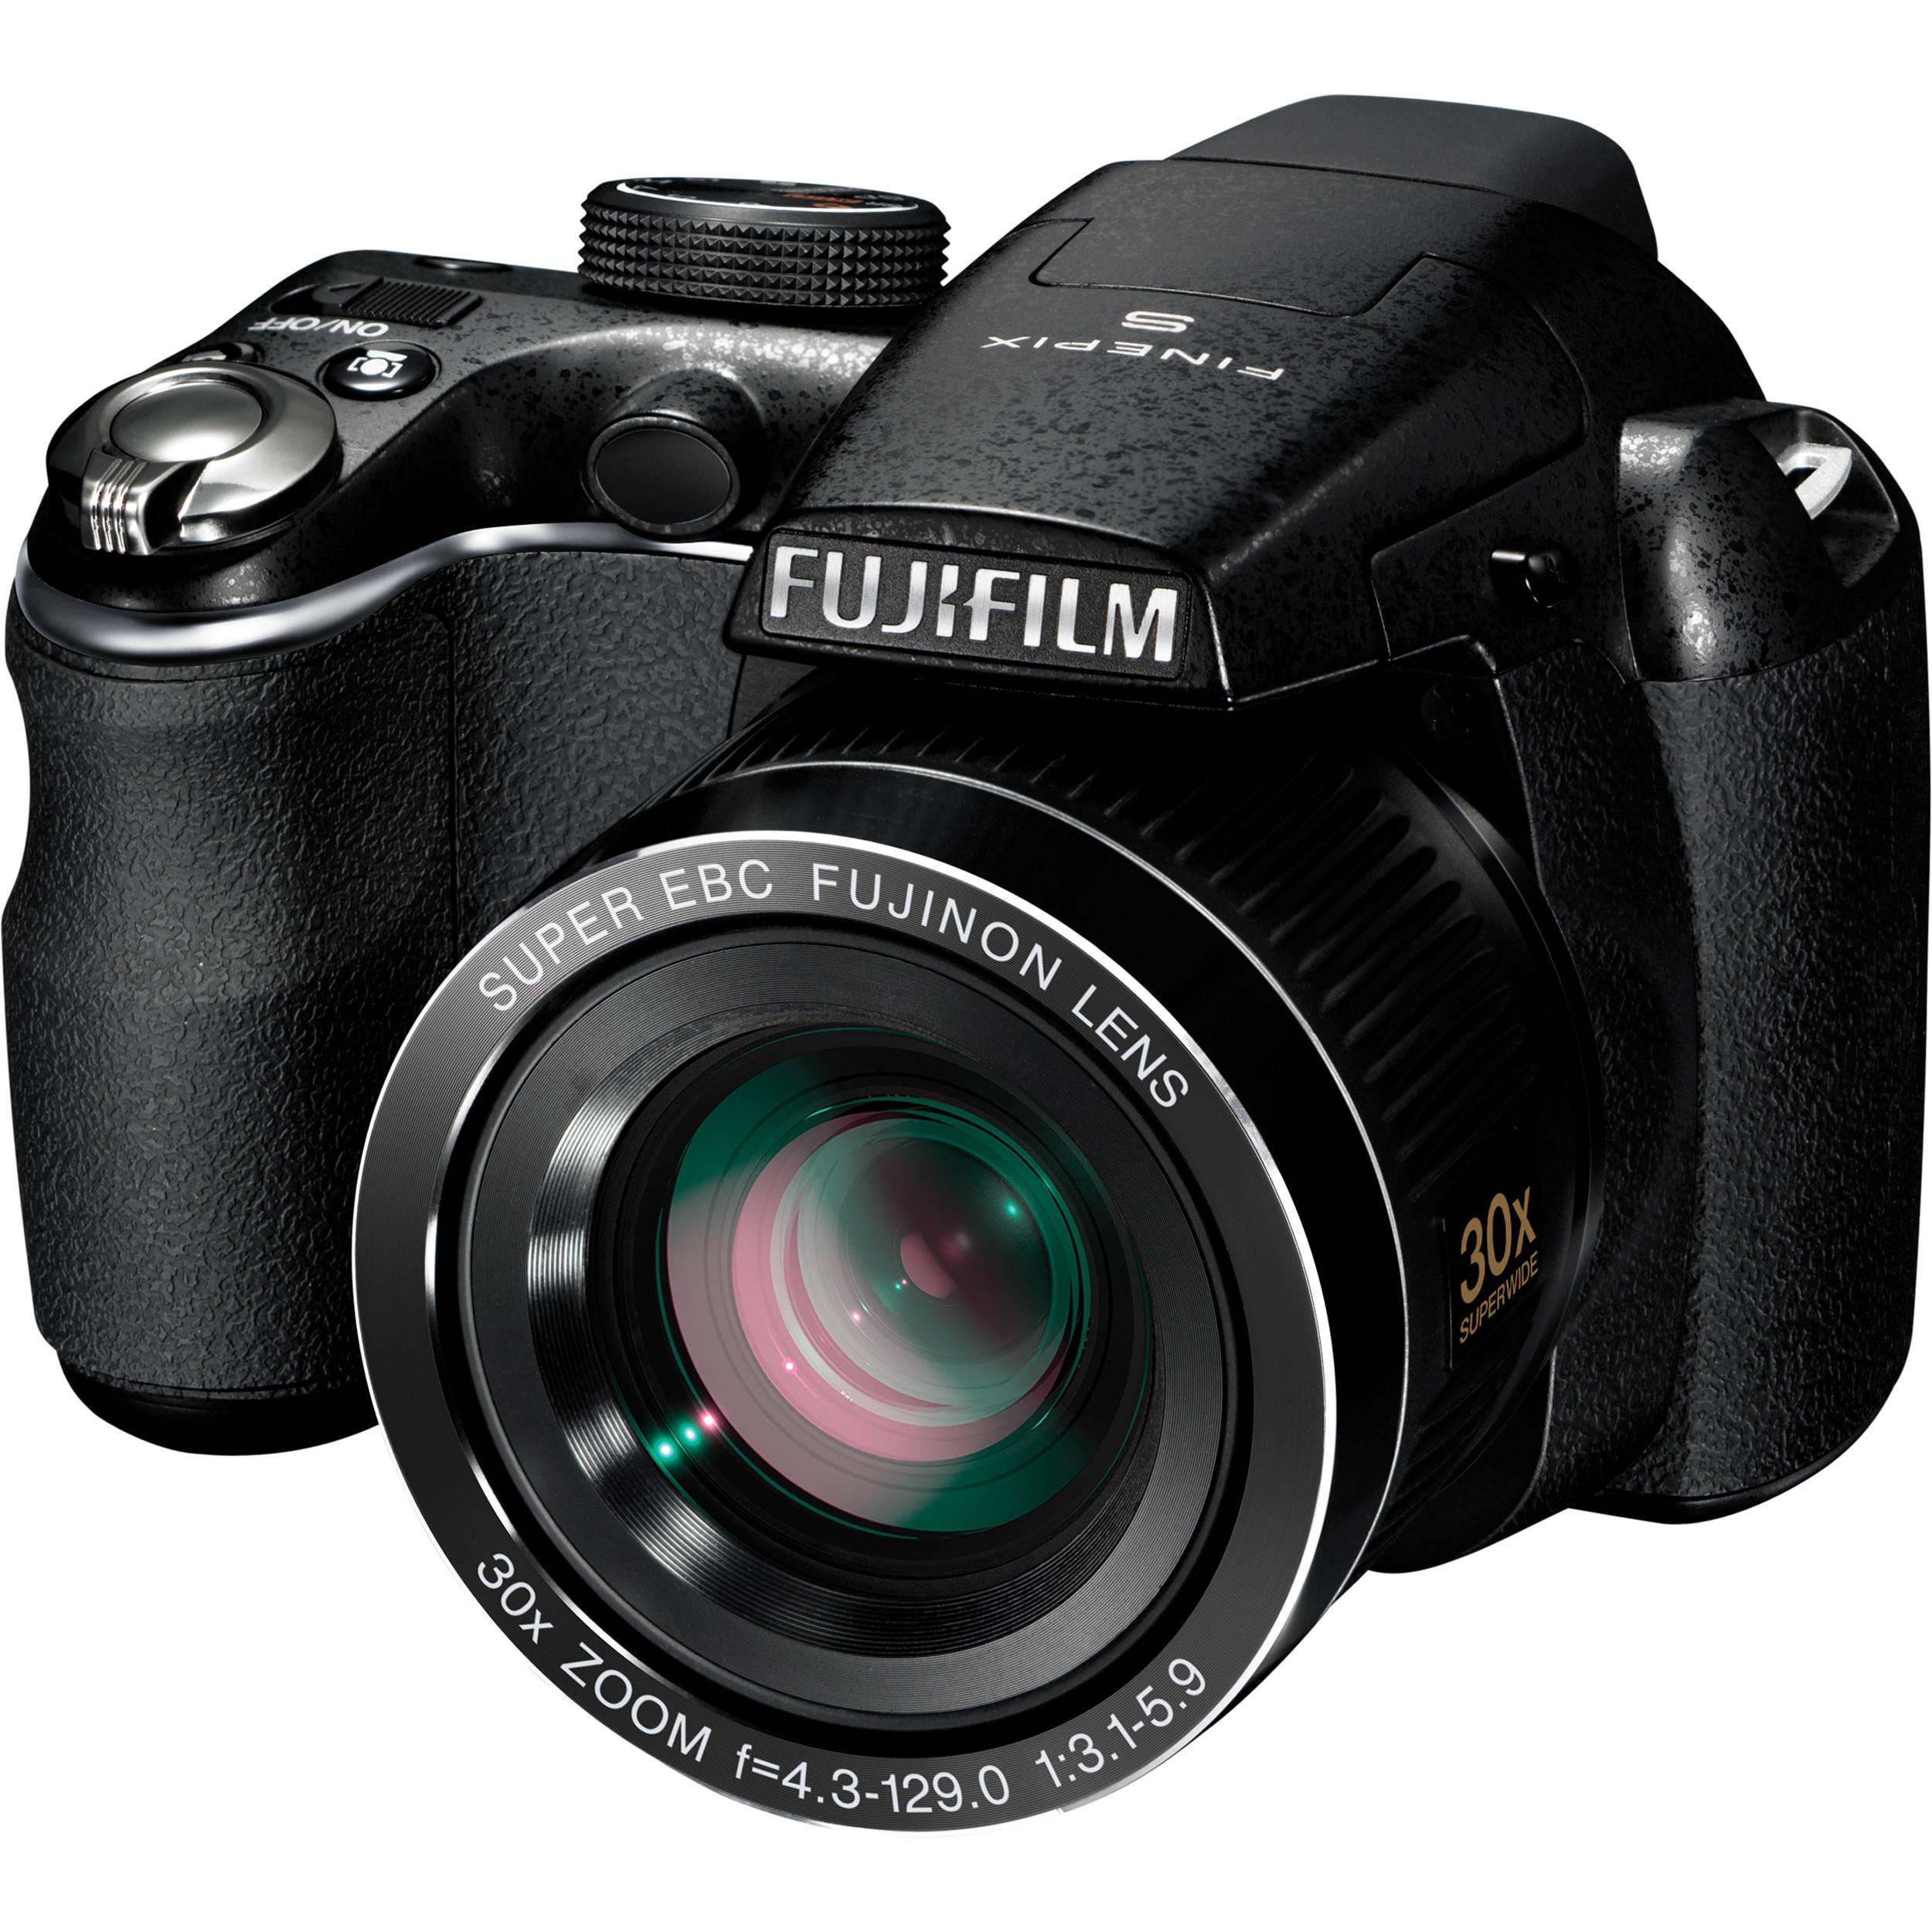 Fuji Digital Cameras